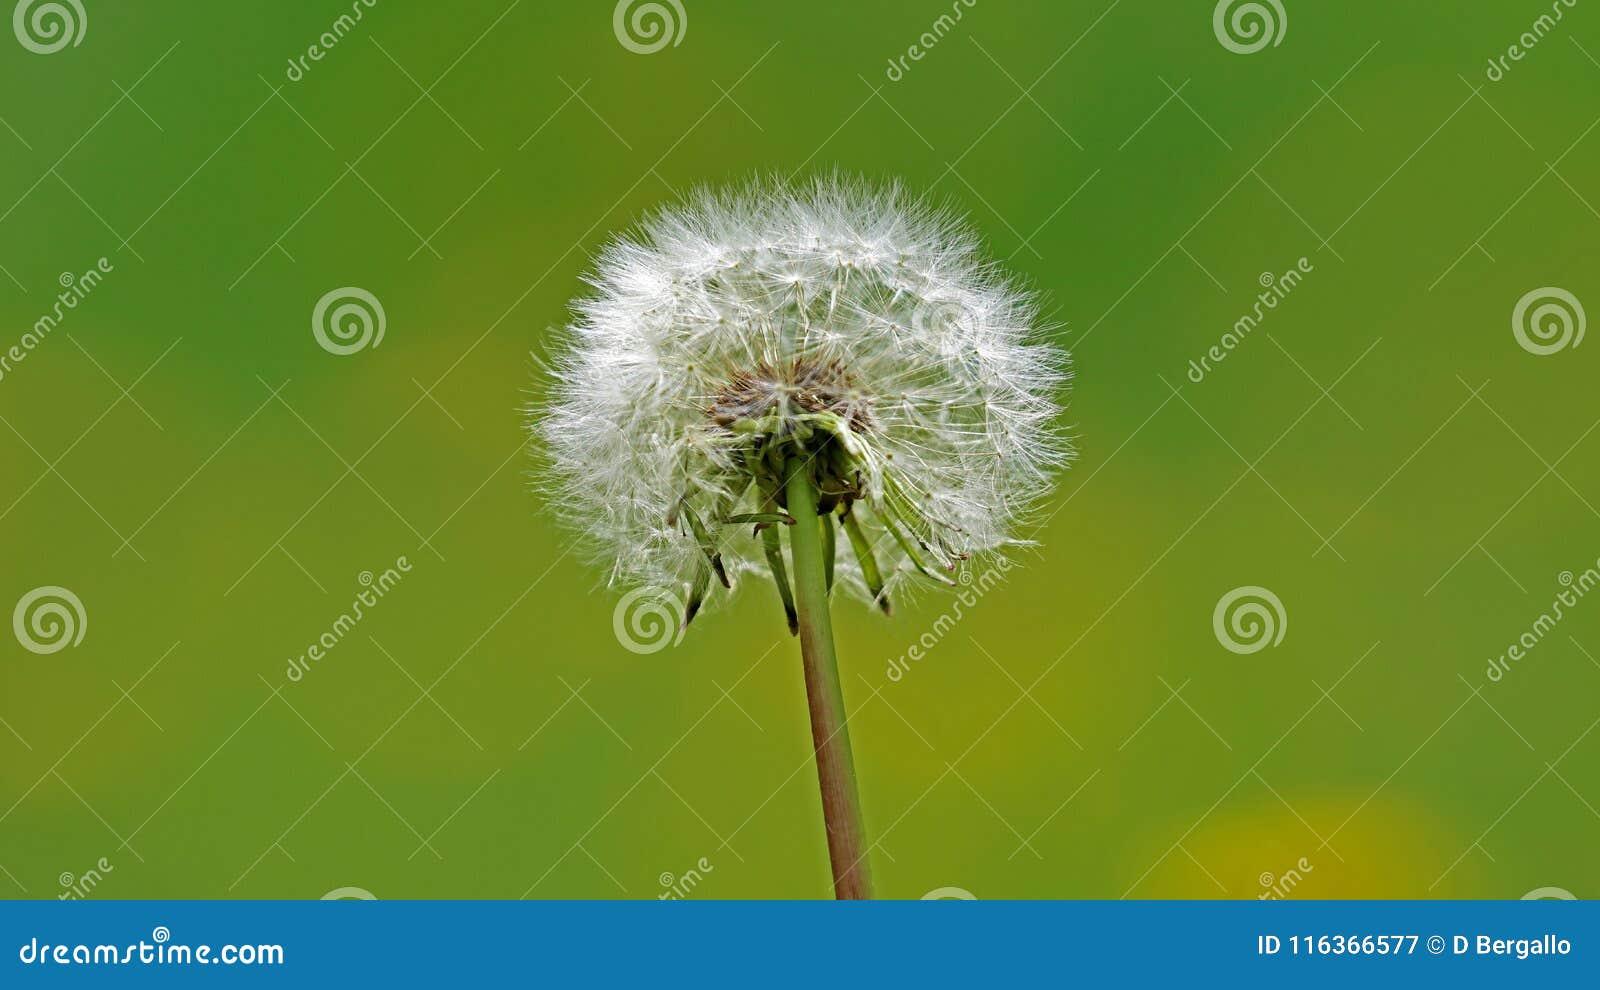 Dandelion Beautiful Unique Yellow Flower Weed Stock Image Image